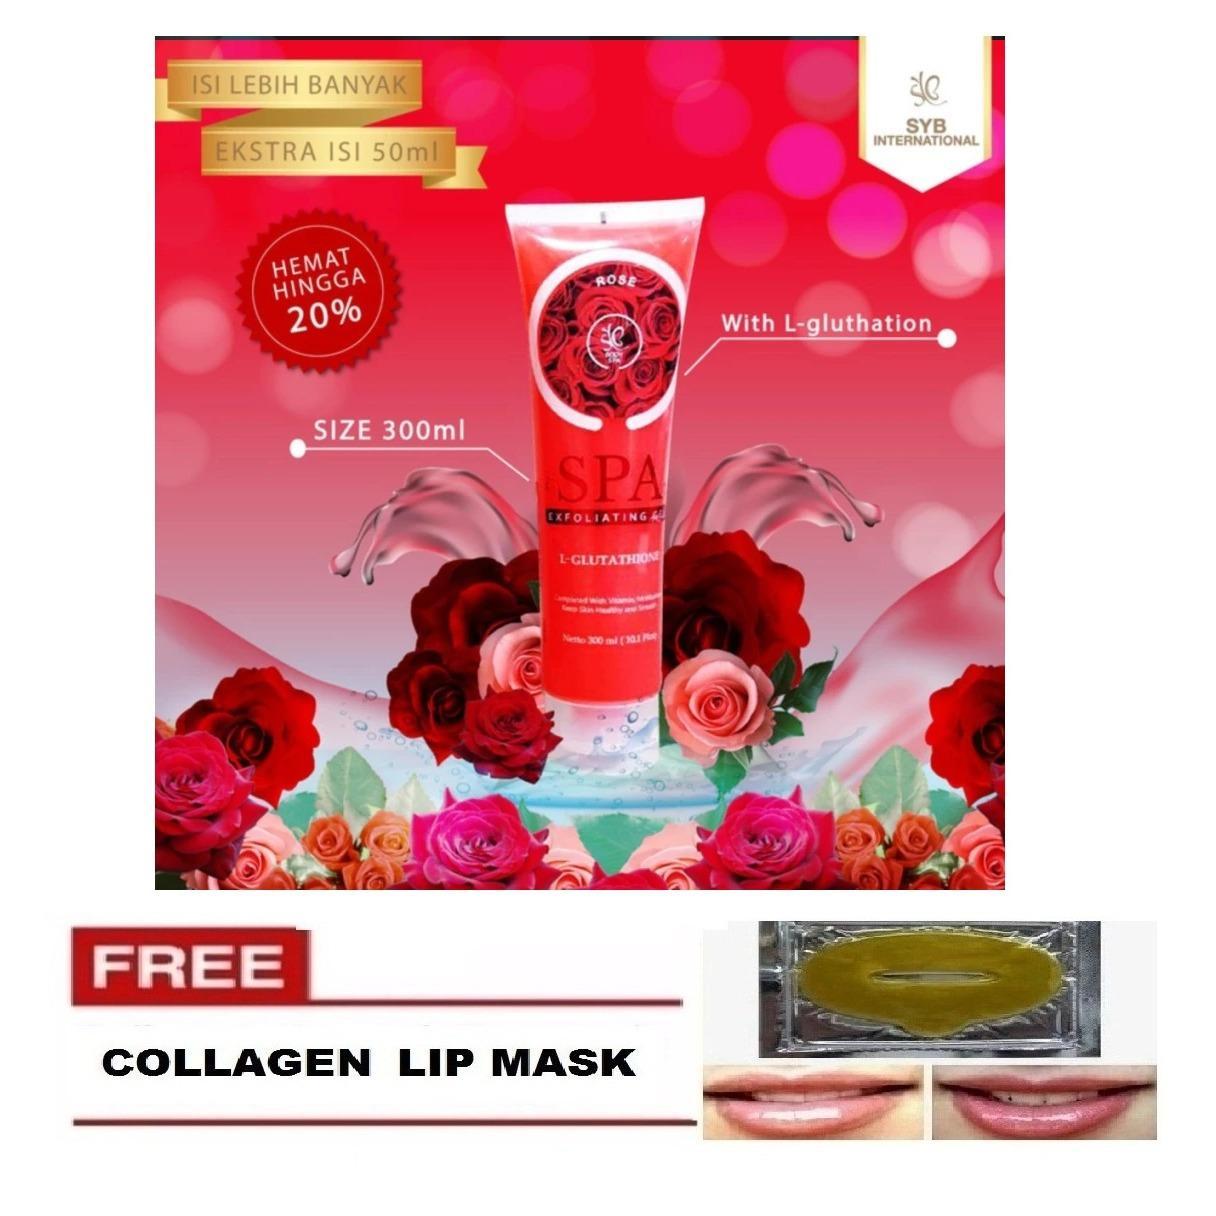 ... exfoliating gel BPOM Original   Shopee Indonesia. Source · Rose Body SPA BPOM by SYB + FREE COLLAGEN LIP MASK - 1 Pcs [FREE